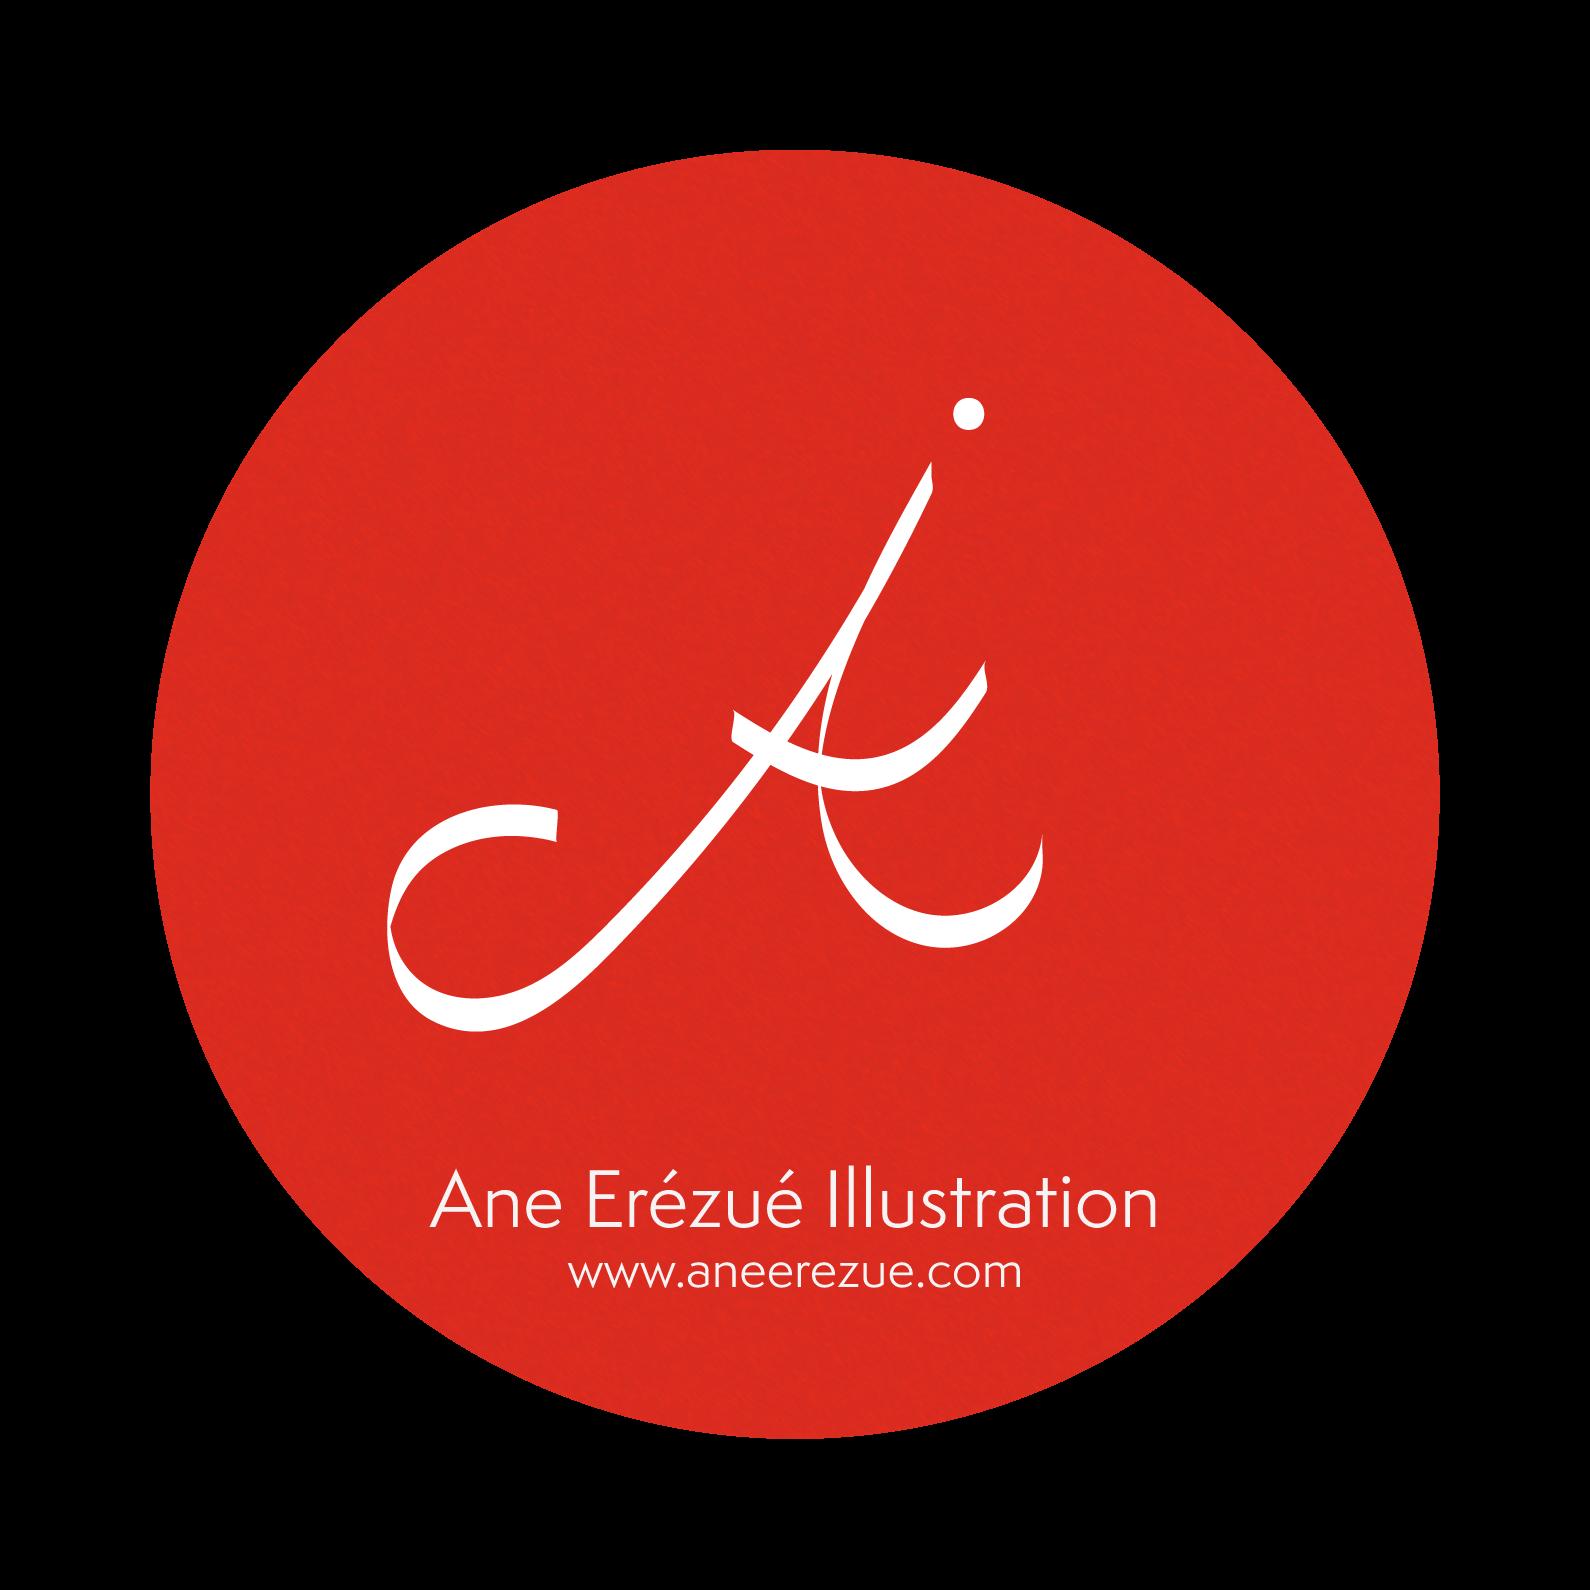 www.aneerezue.com Logo